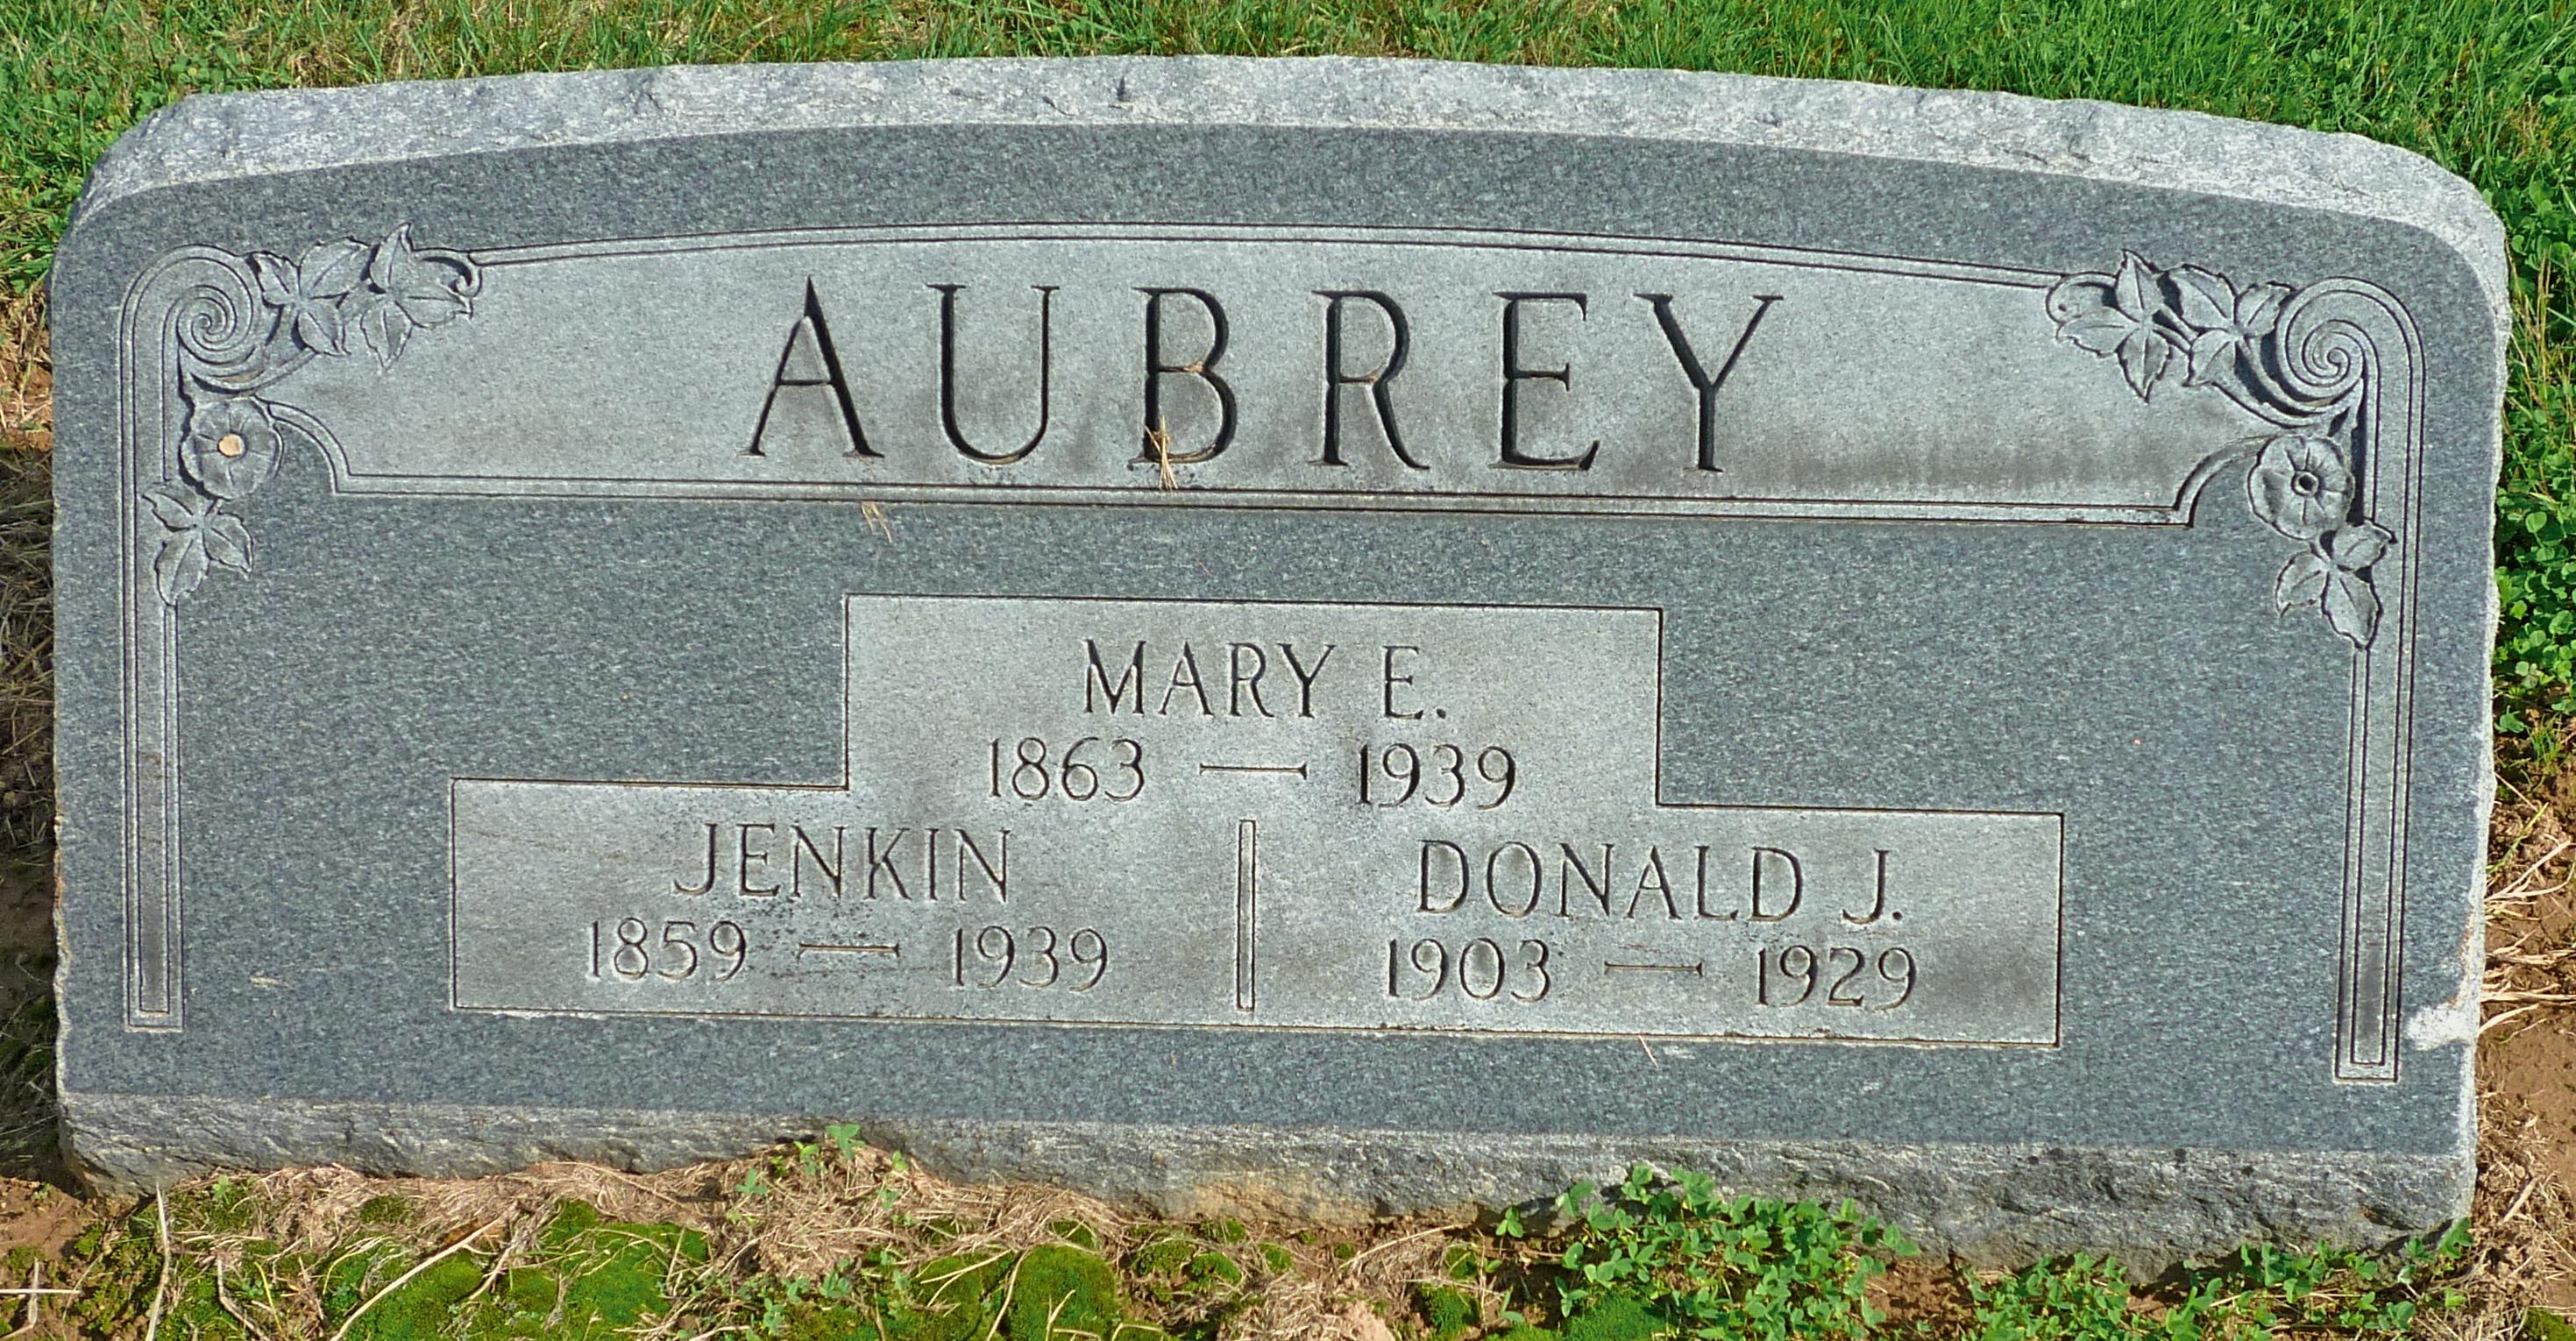 Donald J Aubrey